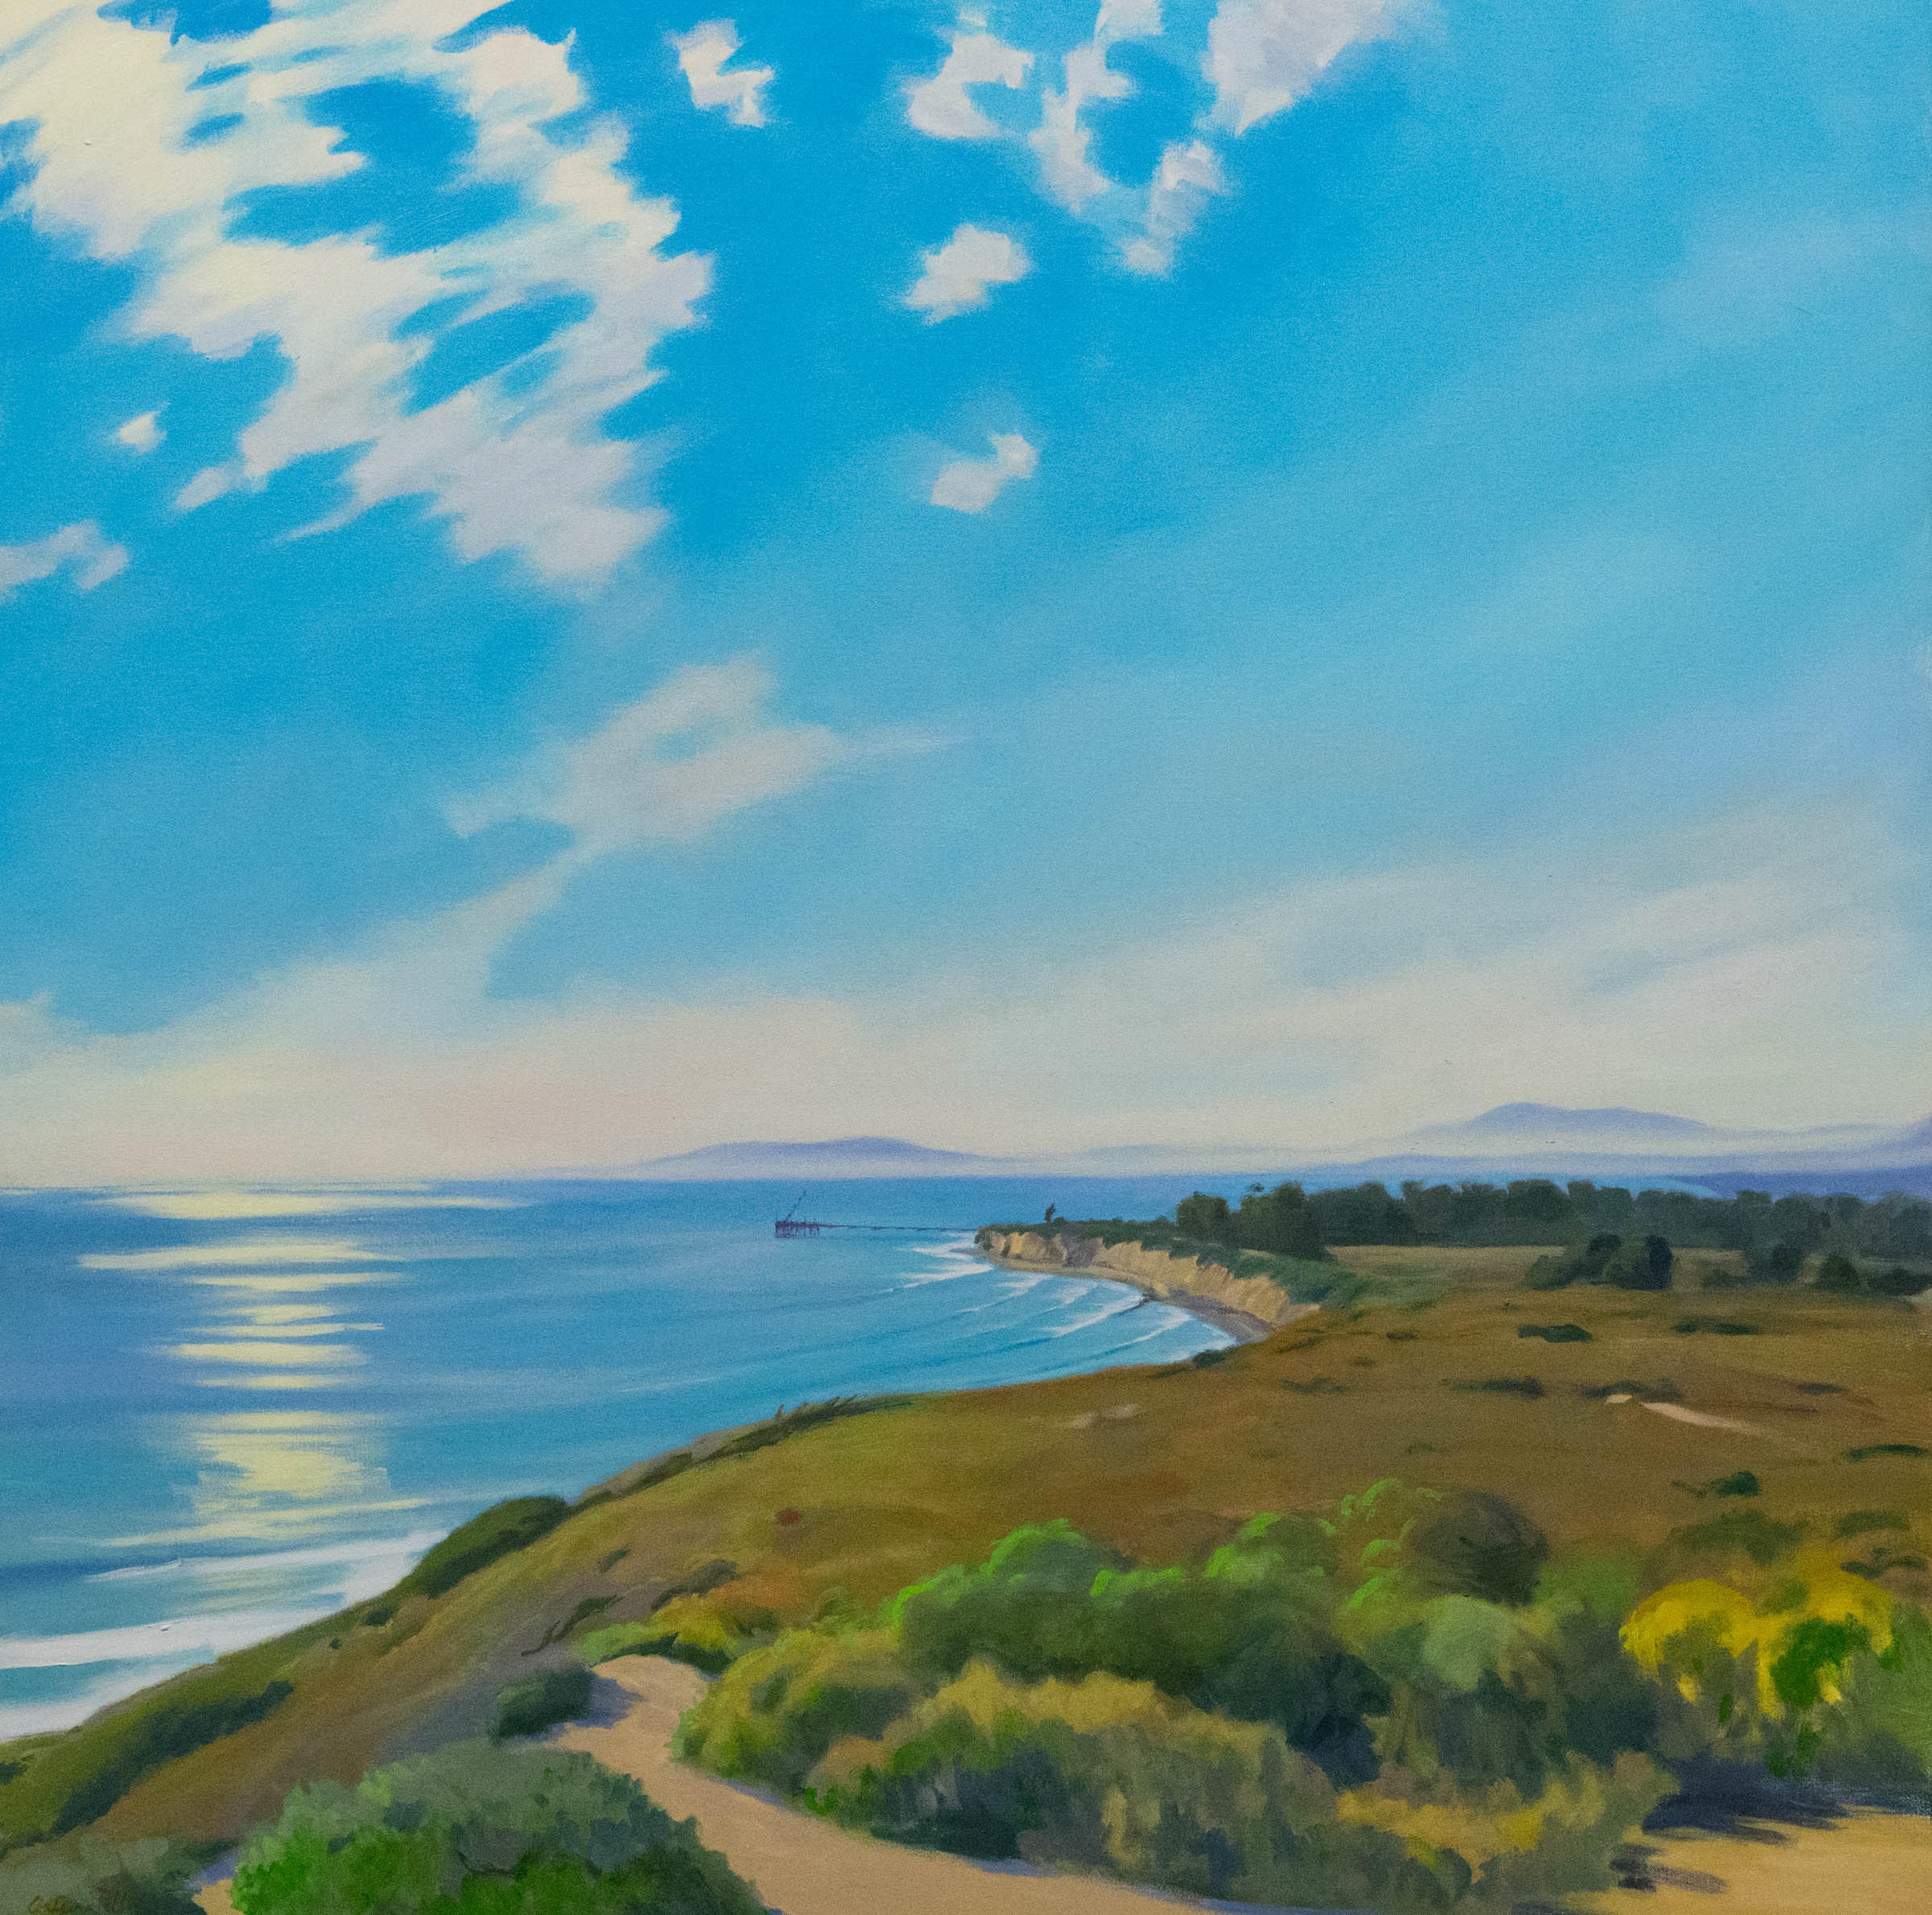 Ray Hunter View of Santa Creuz island